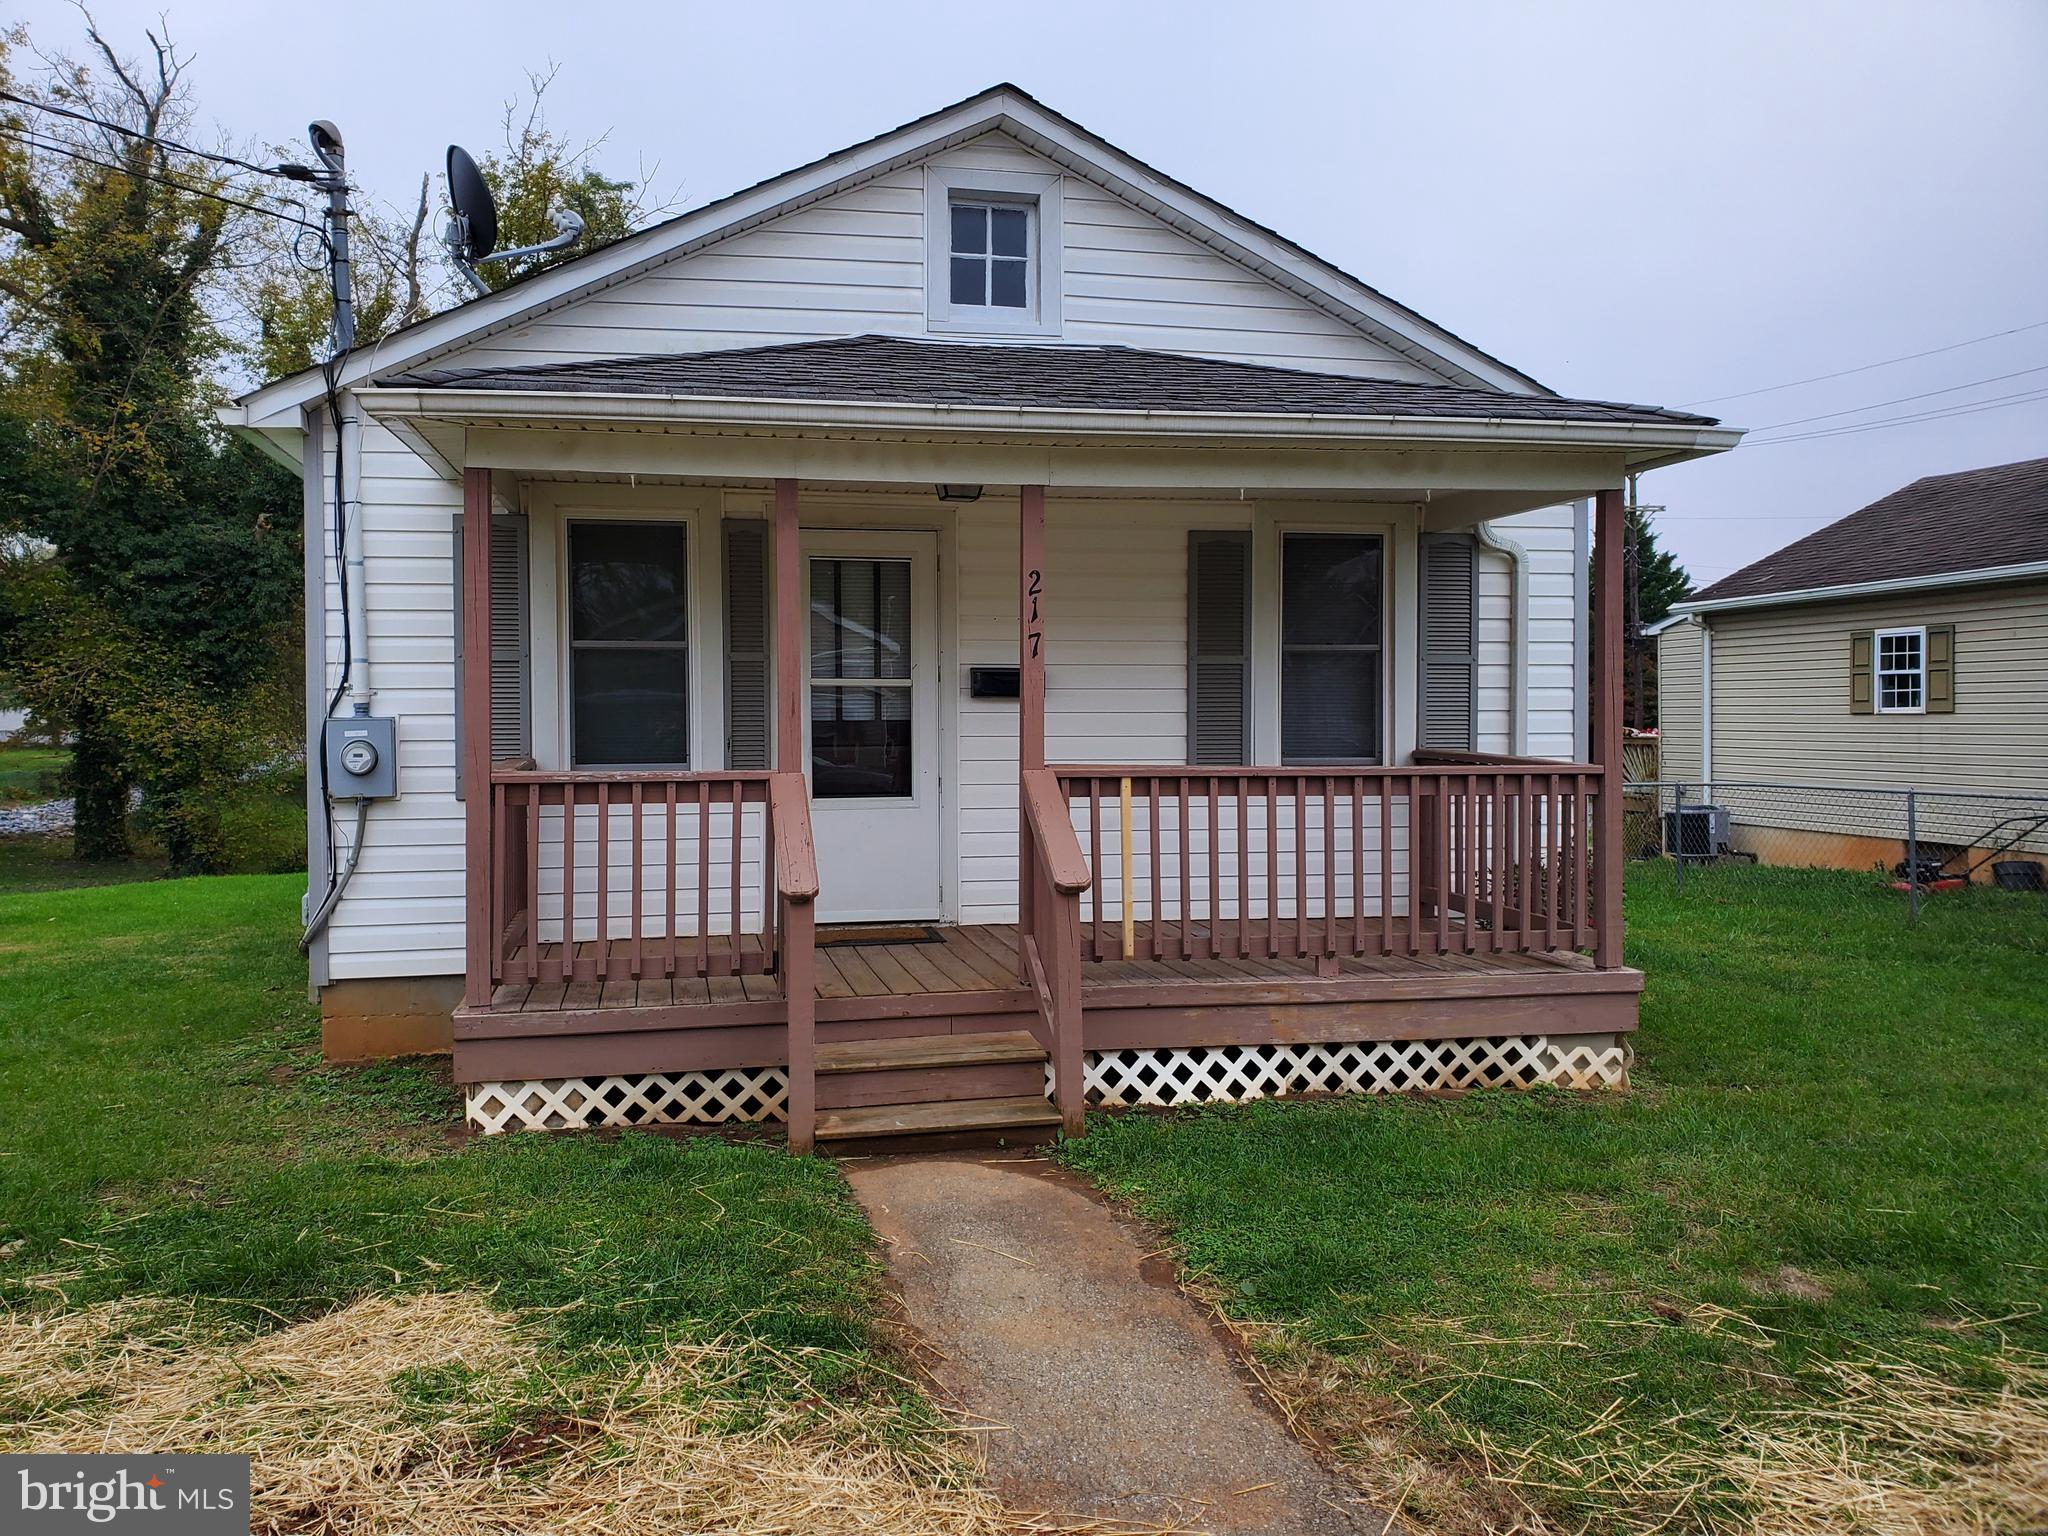 217 4th Ave, Ranson, WV, 25438